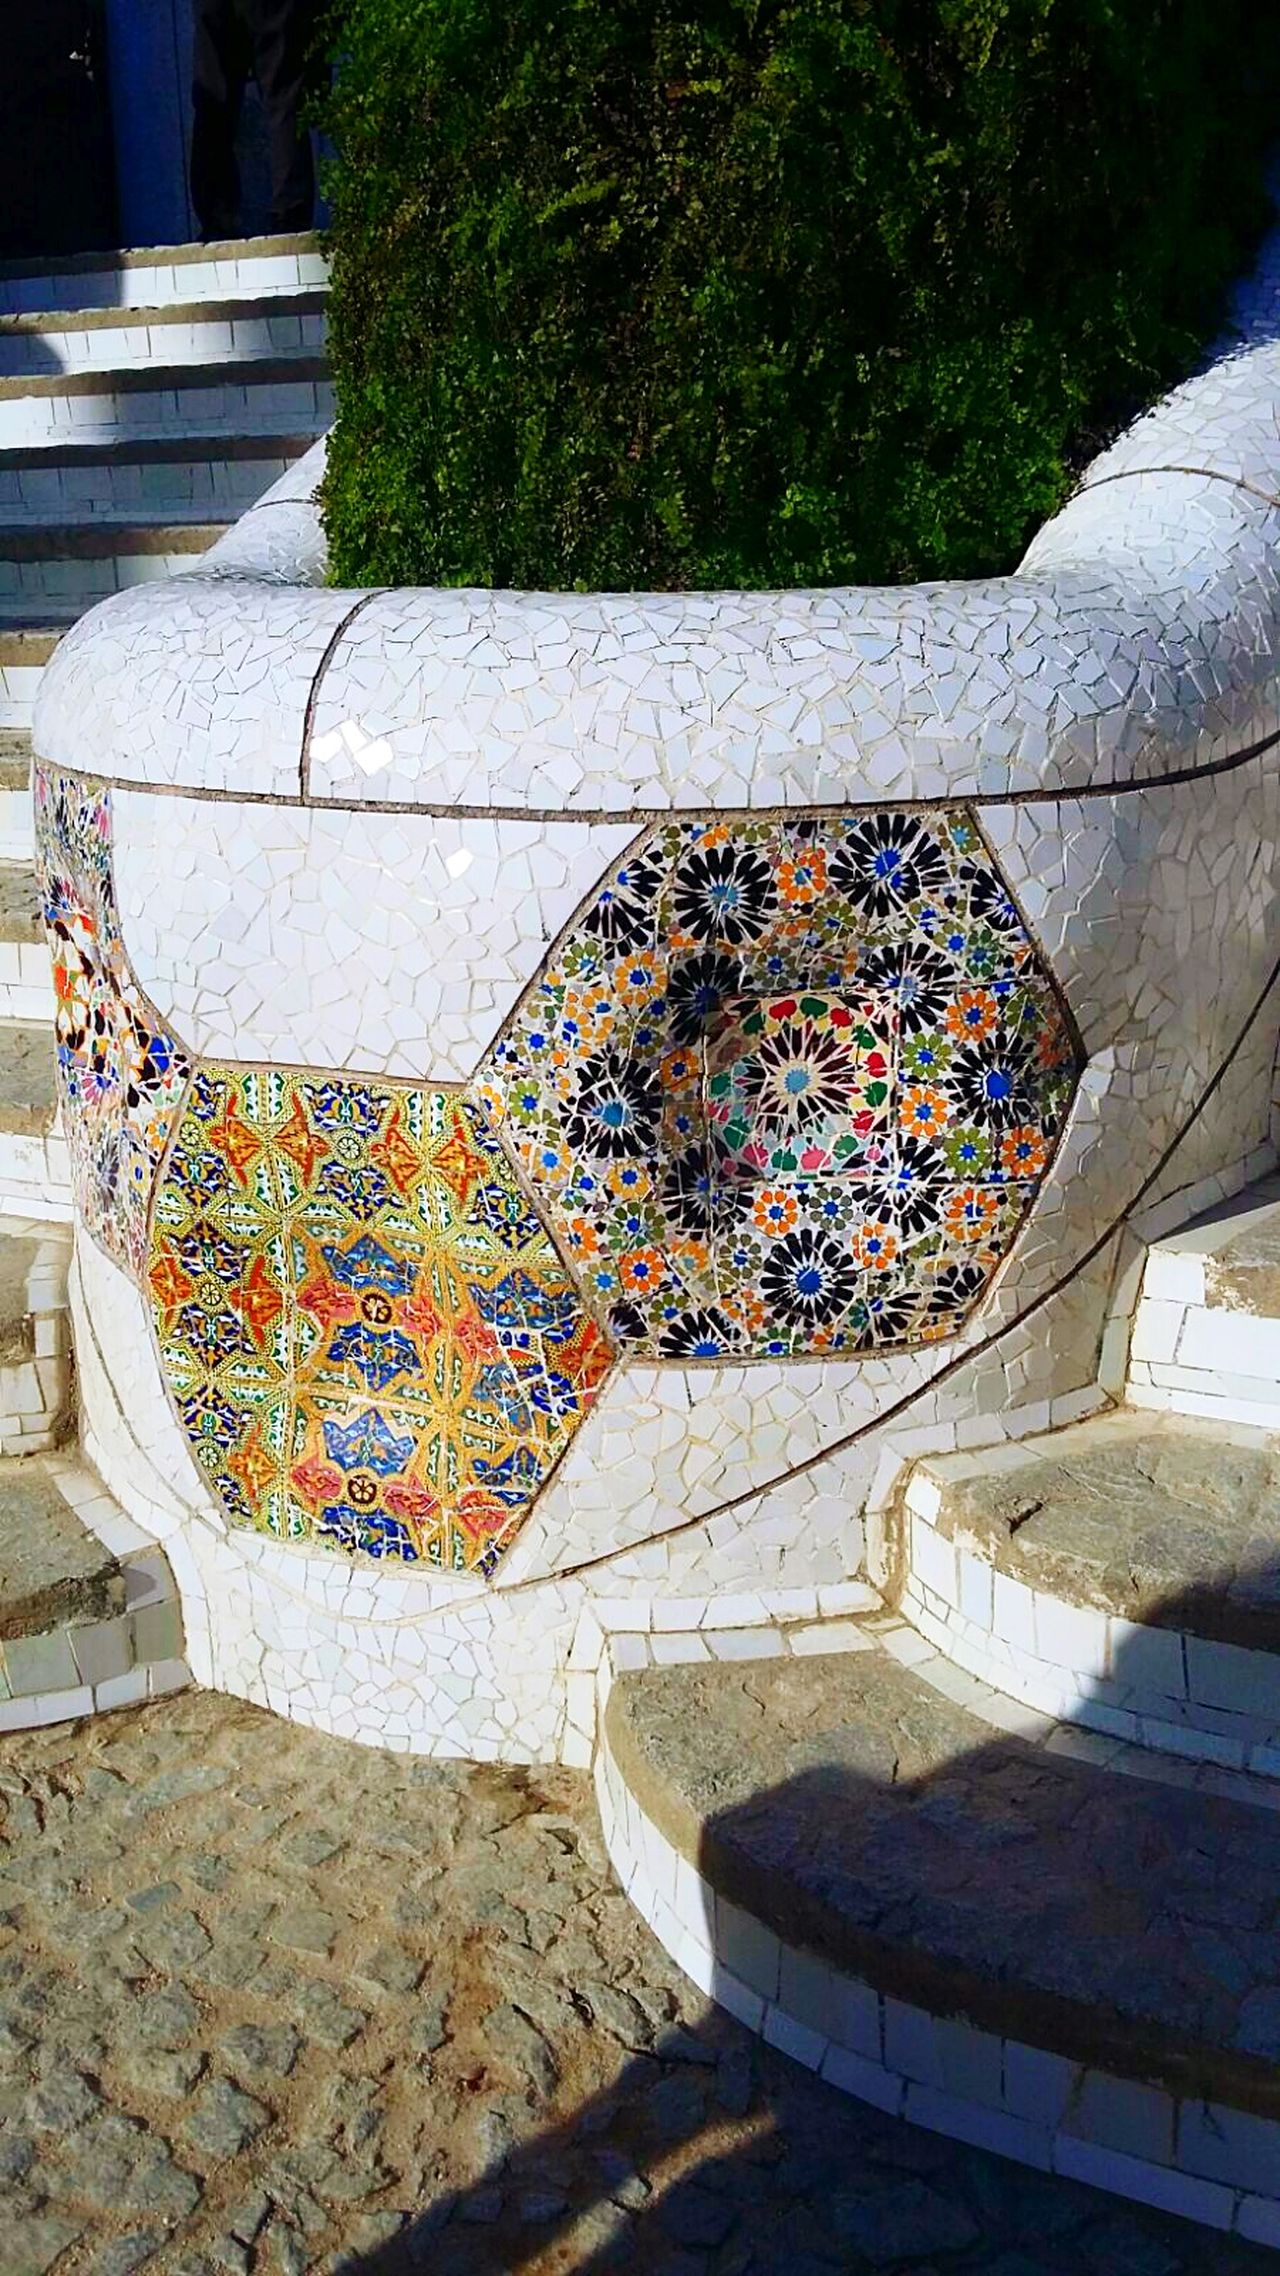 Sunlight Outdoors Day No People Close-up Art Gaudi Barcelona